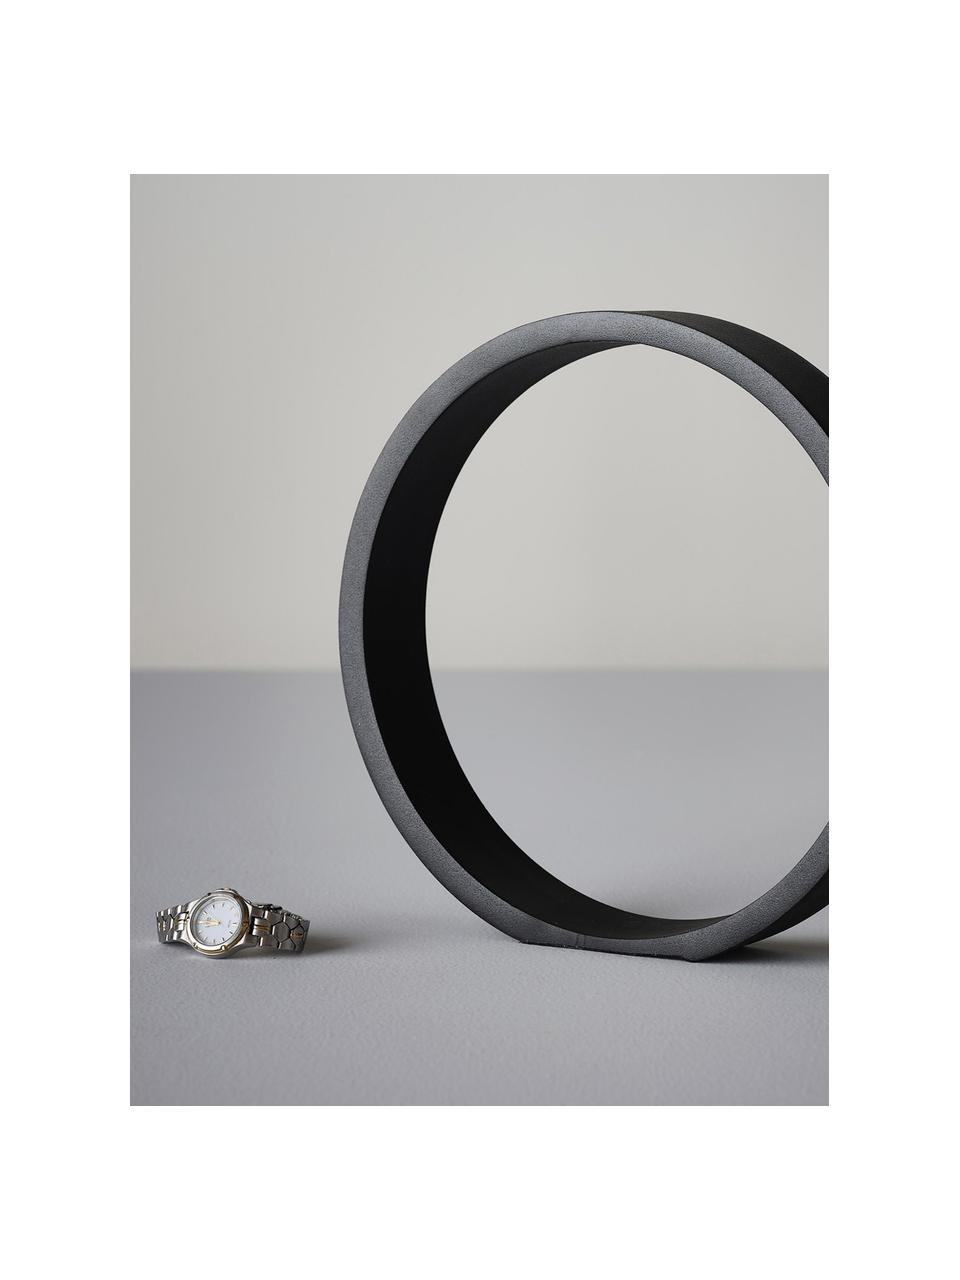 Deko-Objekt Ring, Metall, beschichtet, Schwarz, 25 x 25 cm